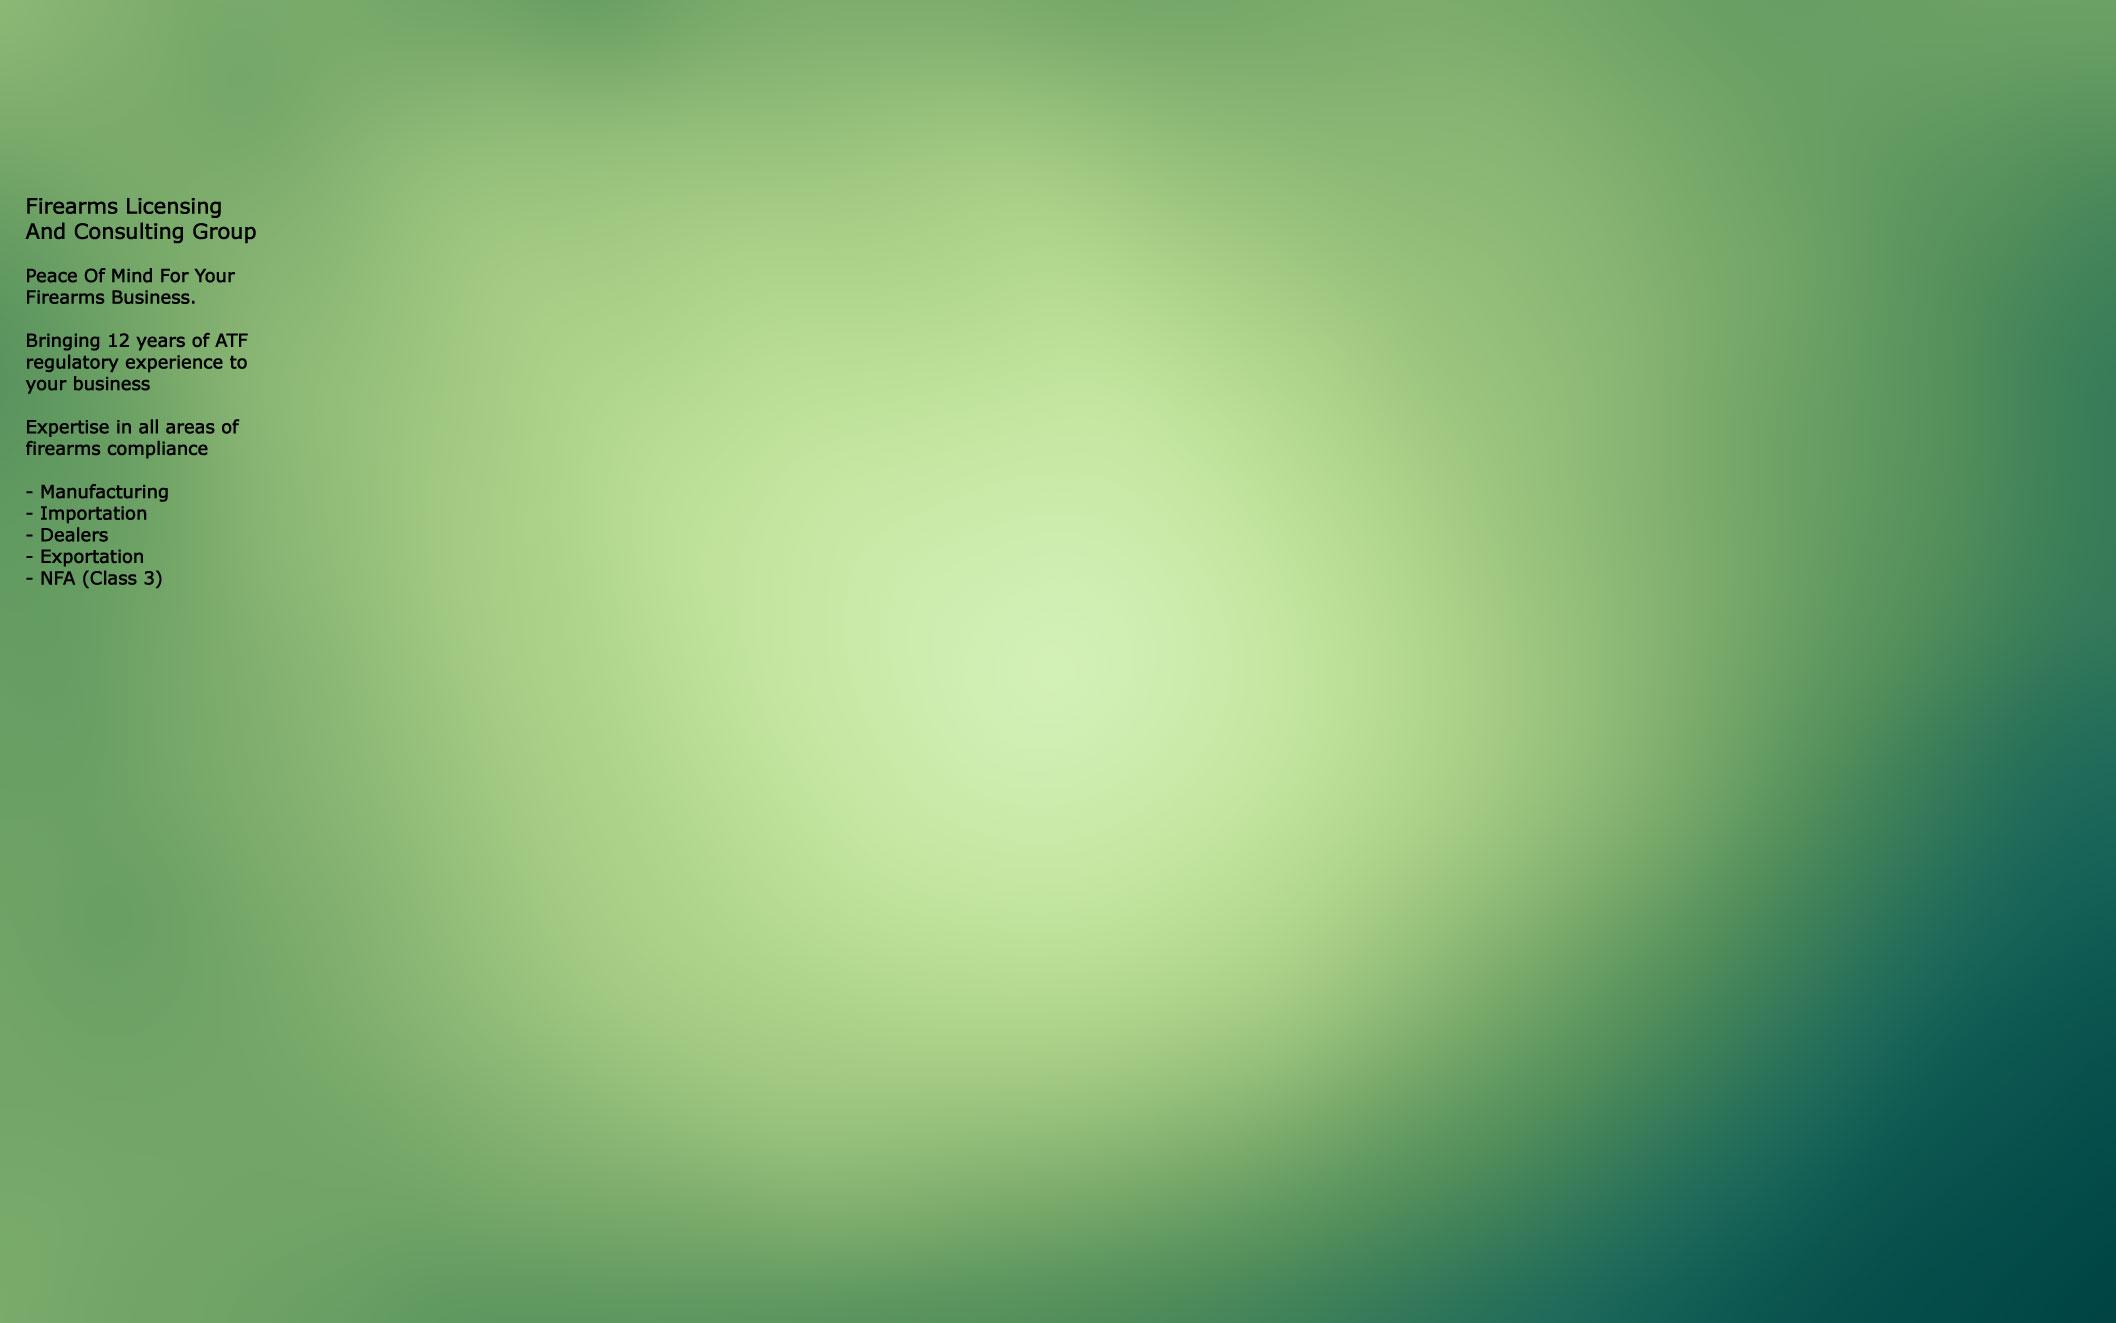 HD-Green-Background-July-23-2014-test-14.jpg